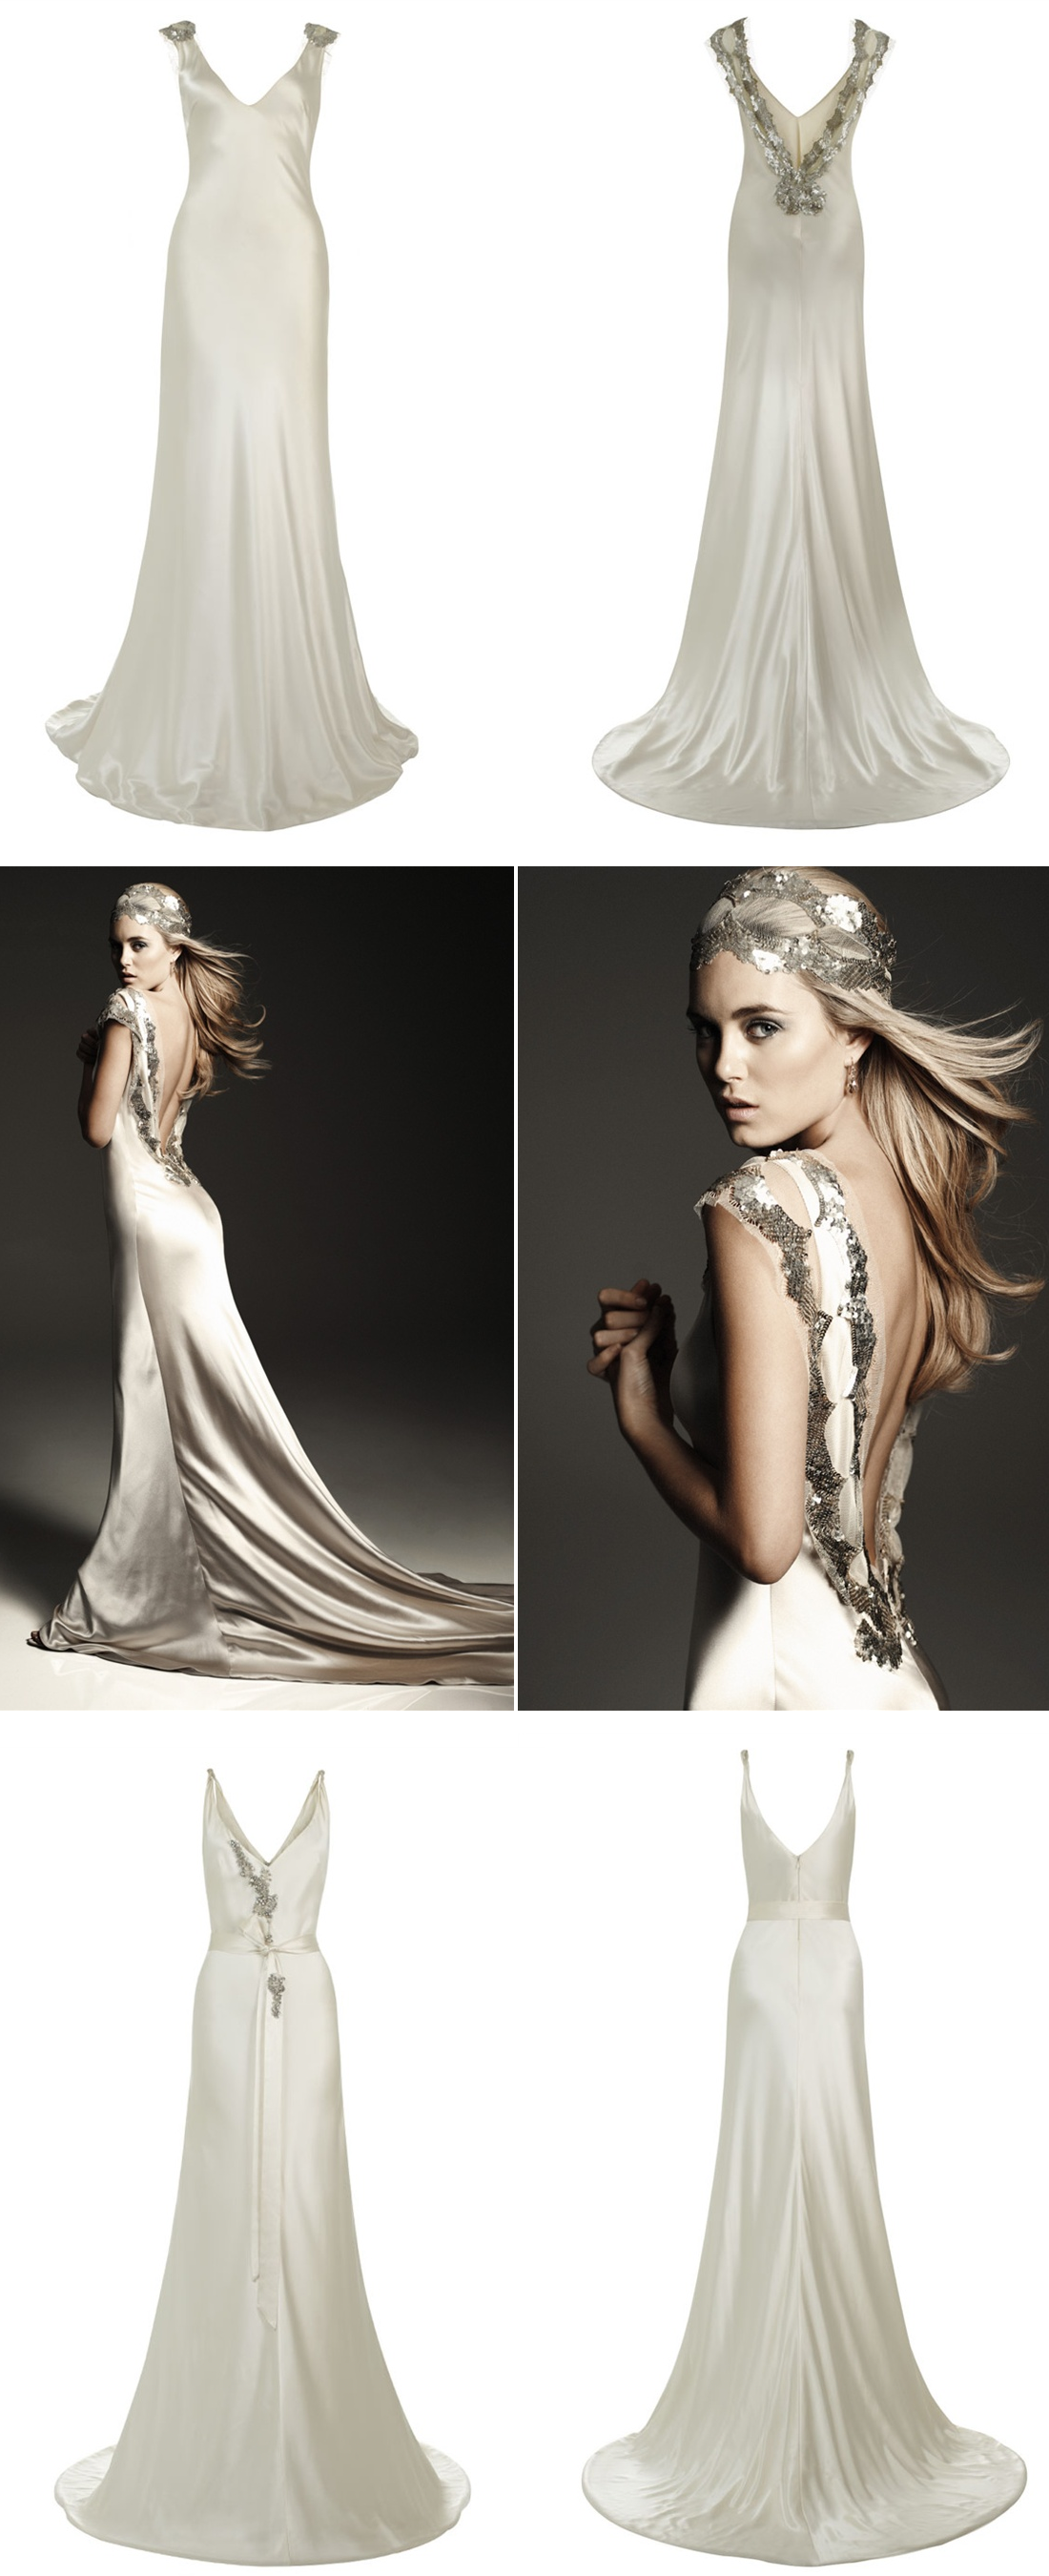 JOHANNA JOHNSON WEDDING DRESSES 2012 BRIDAL GOWN   Johanna Johnson ...